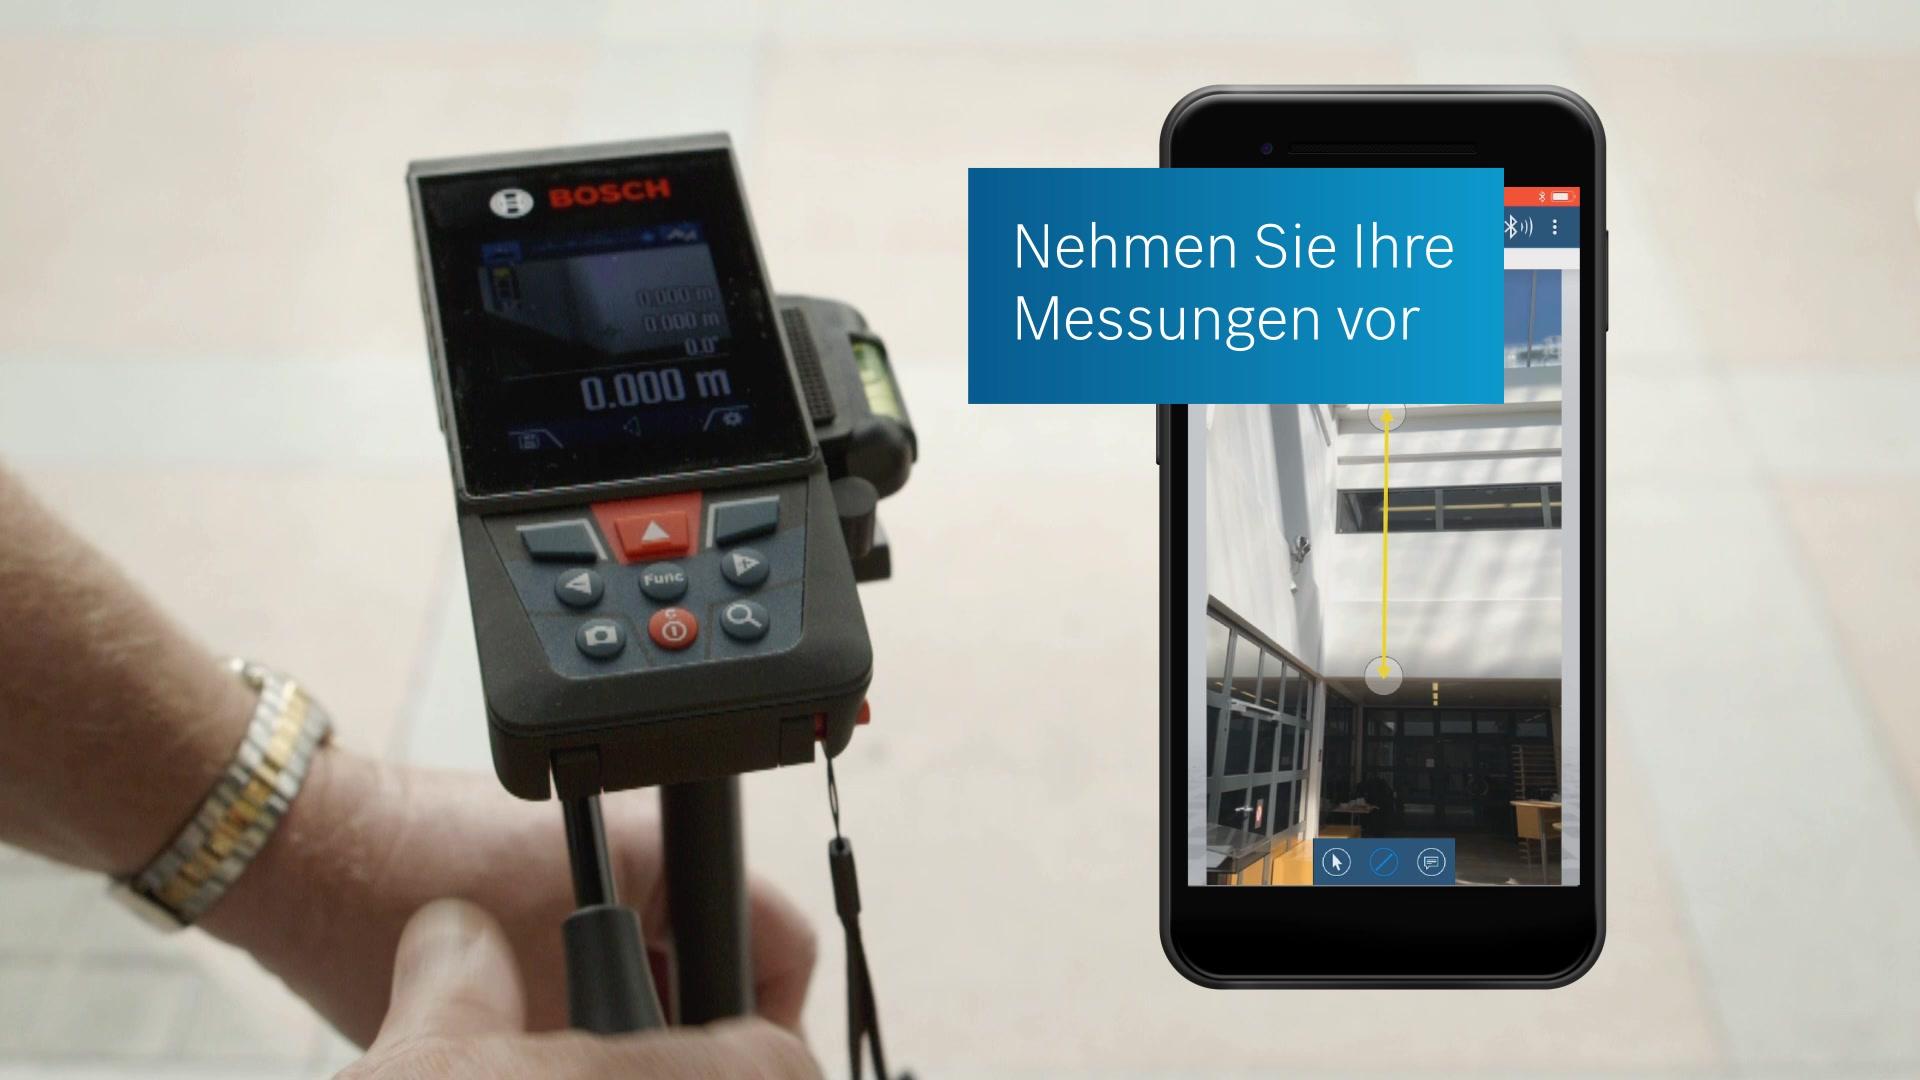 Iphone Entfernungsmesser Ikea : Laser entfernungsmesser bosch flashsms